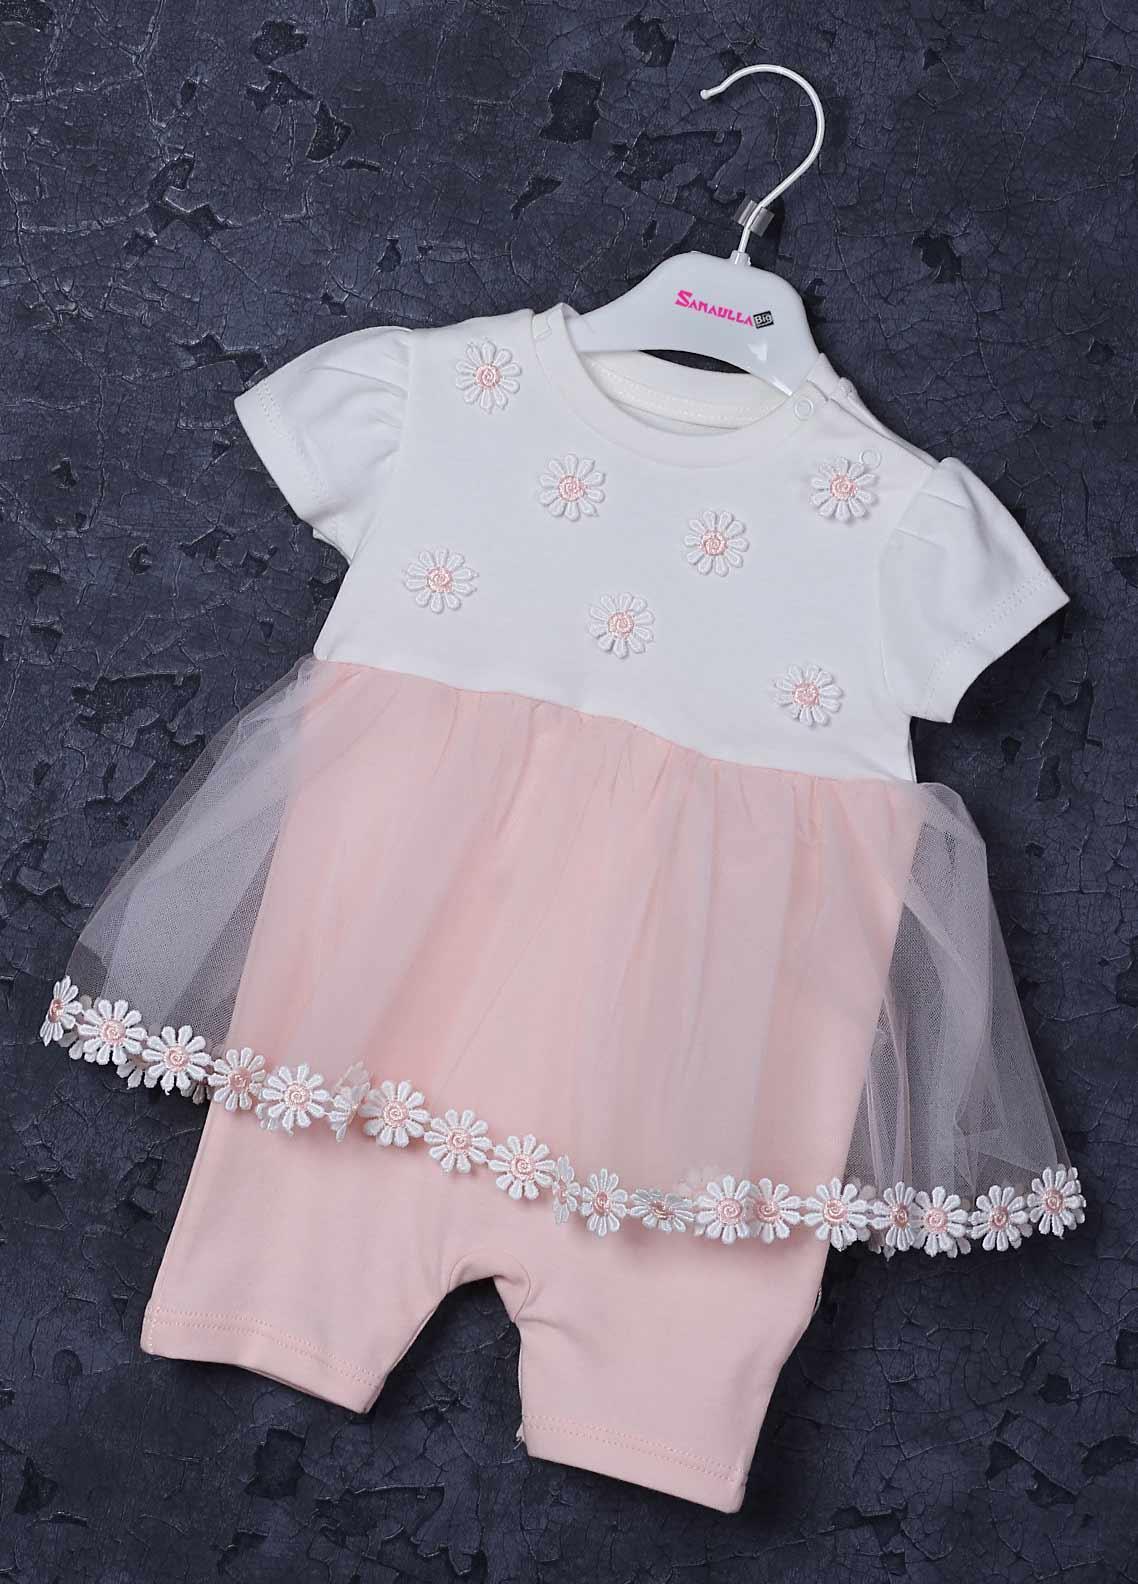 Sanaulla Exclusive Range Cotton Fancy Frocks for Girls -  2232 Pink